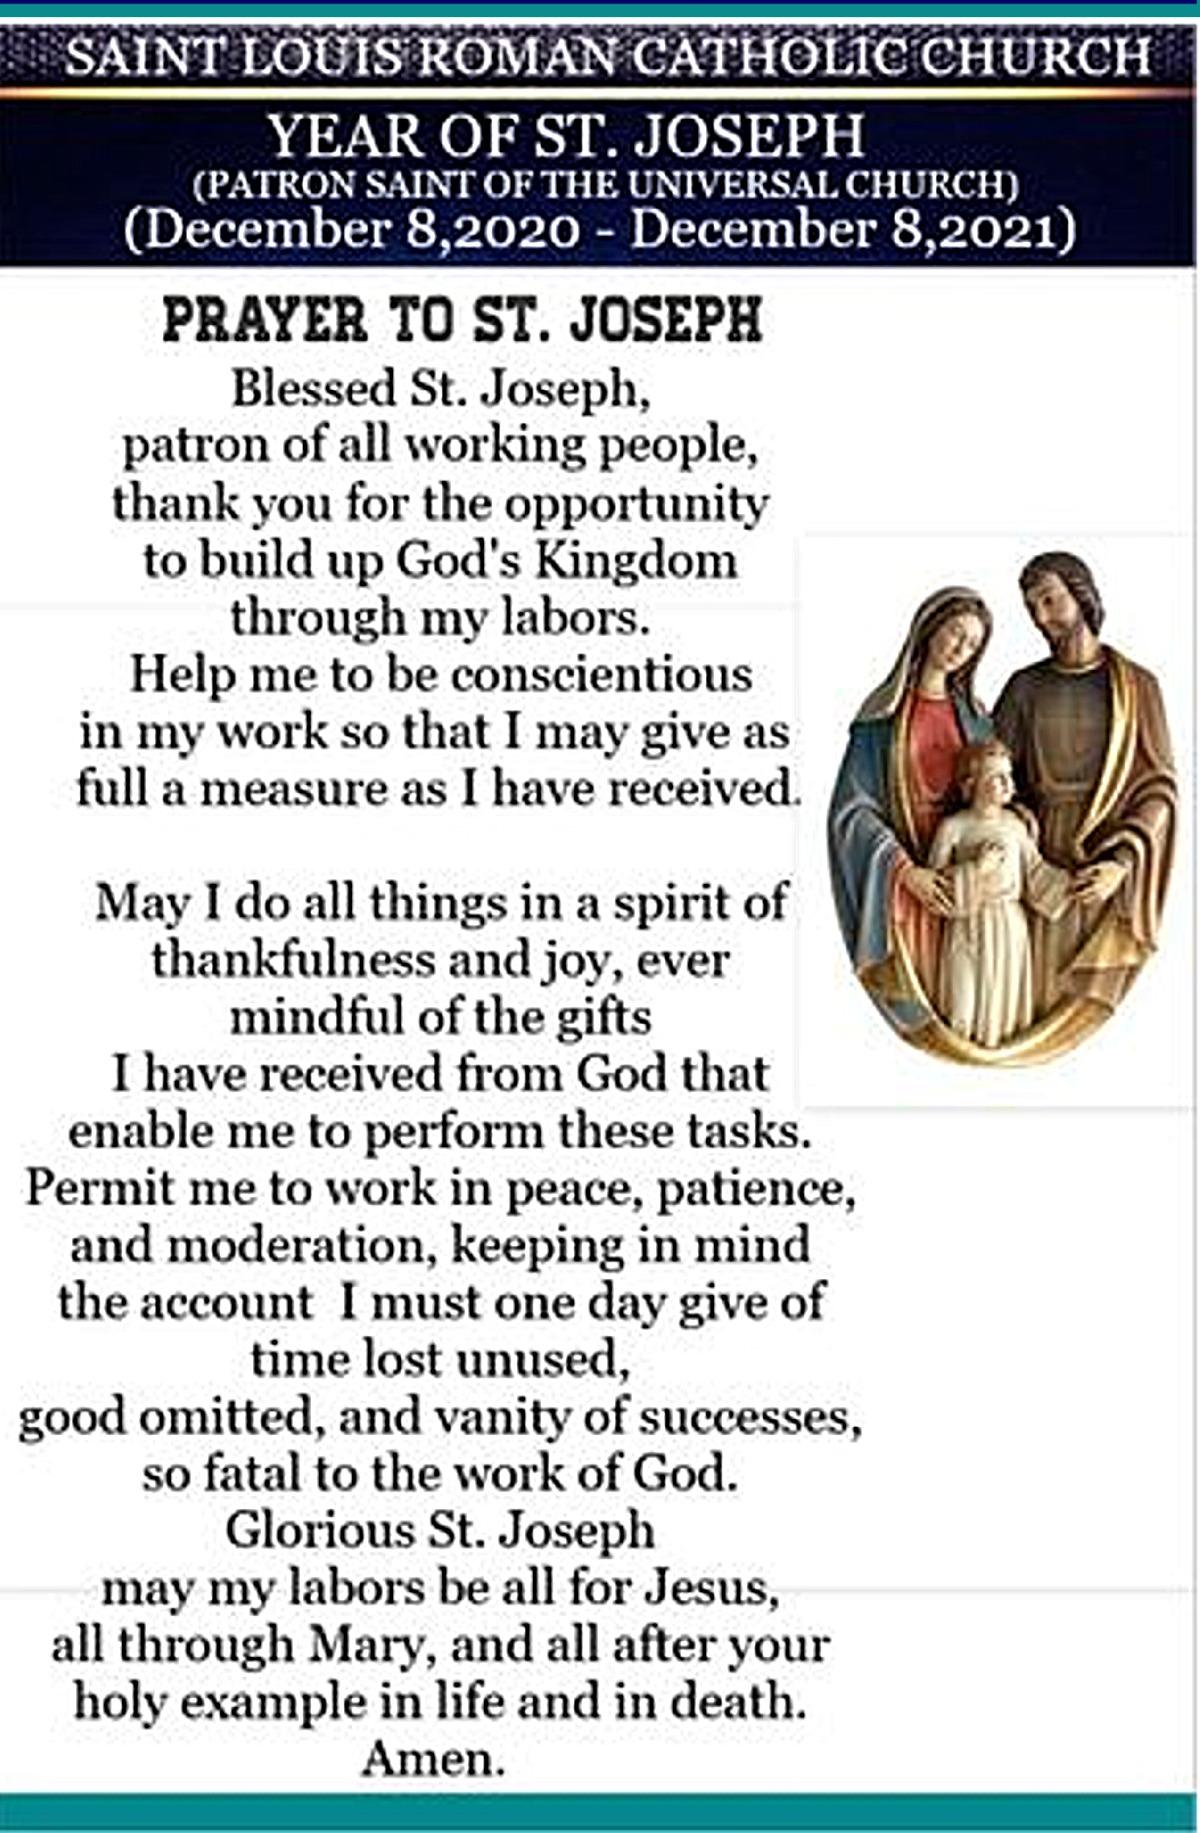 St. Louis - Prayer to St. Joseph